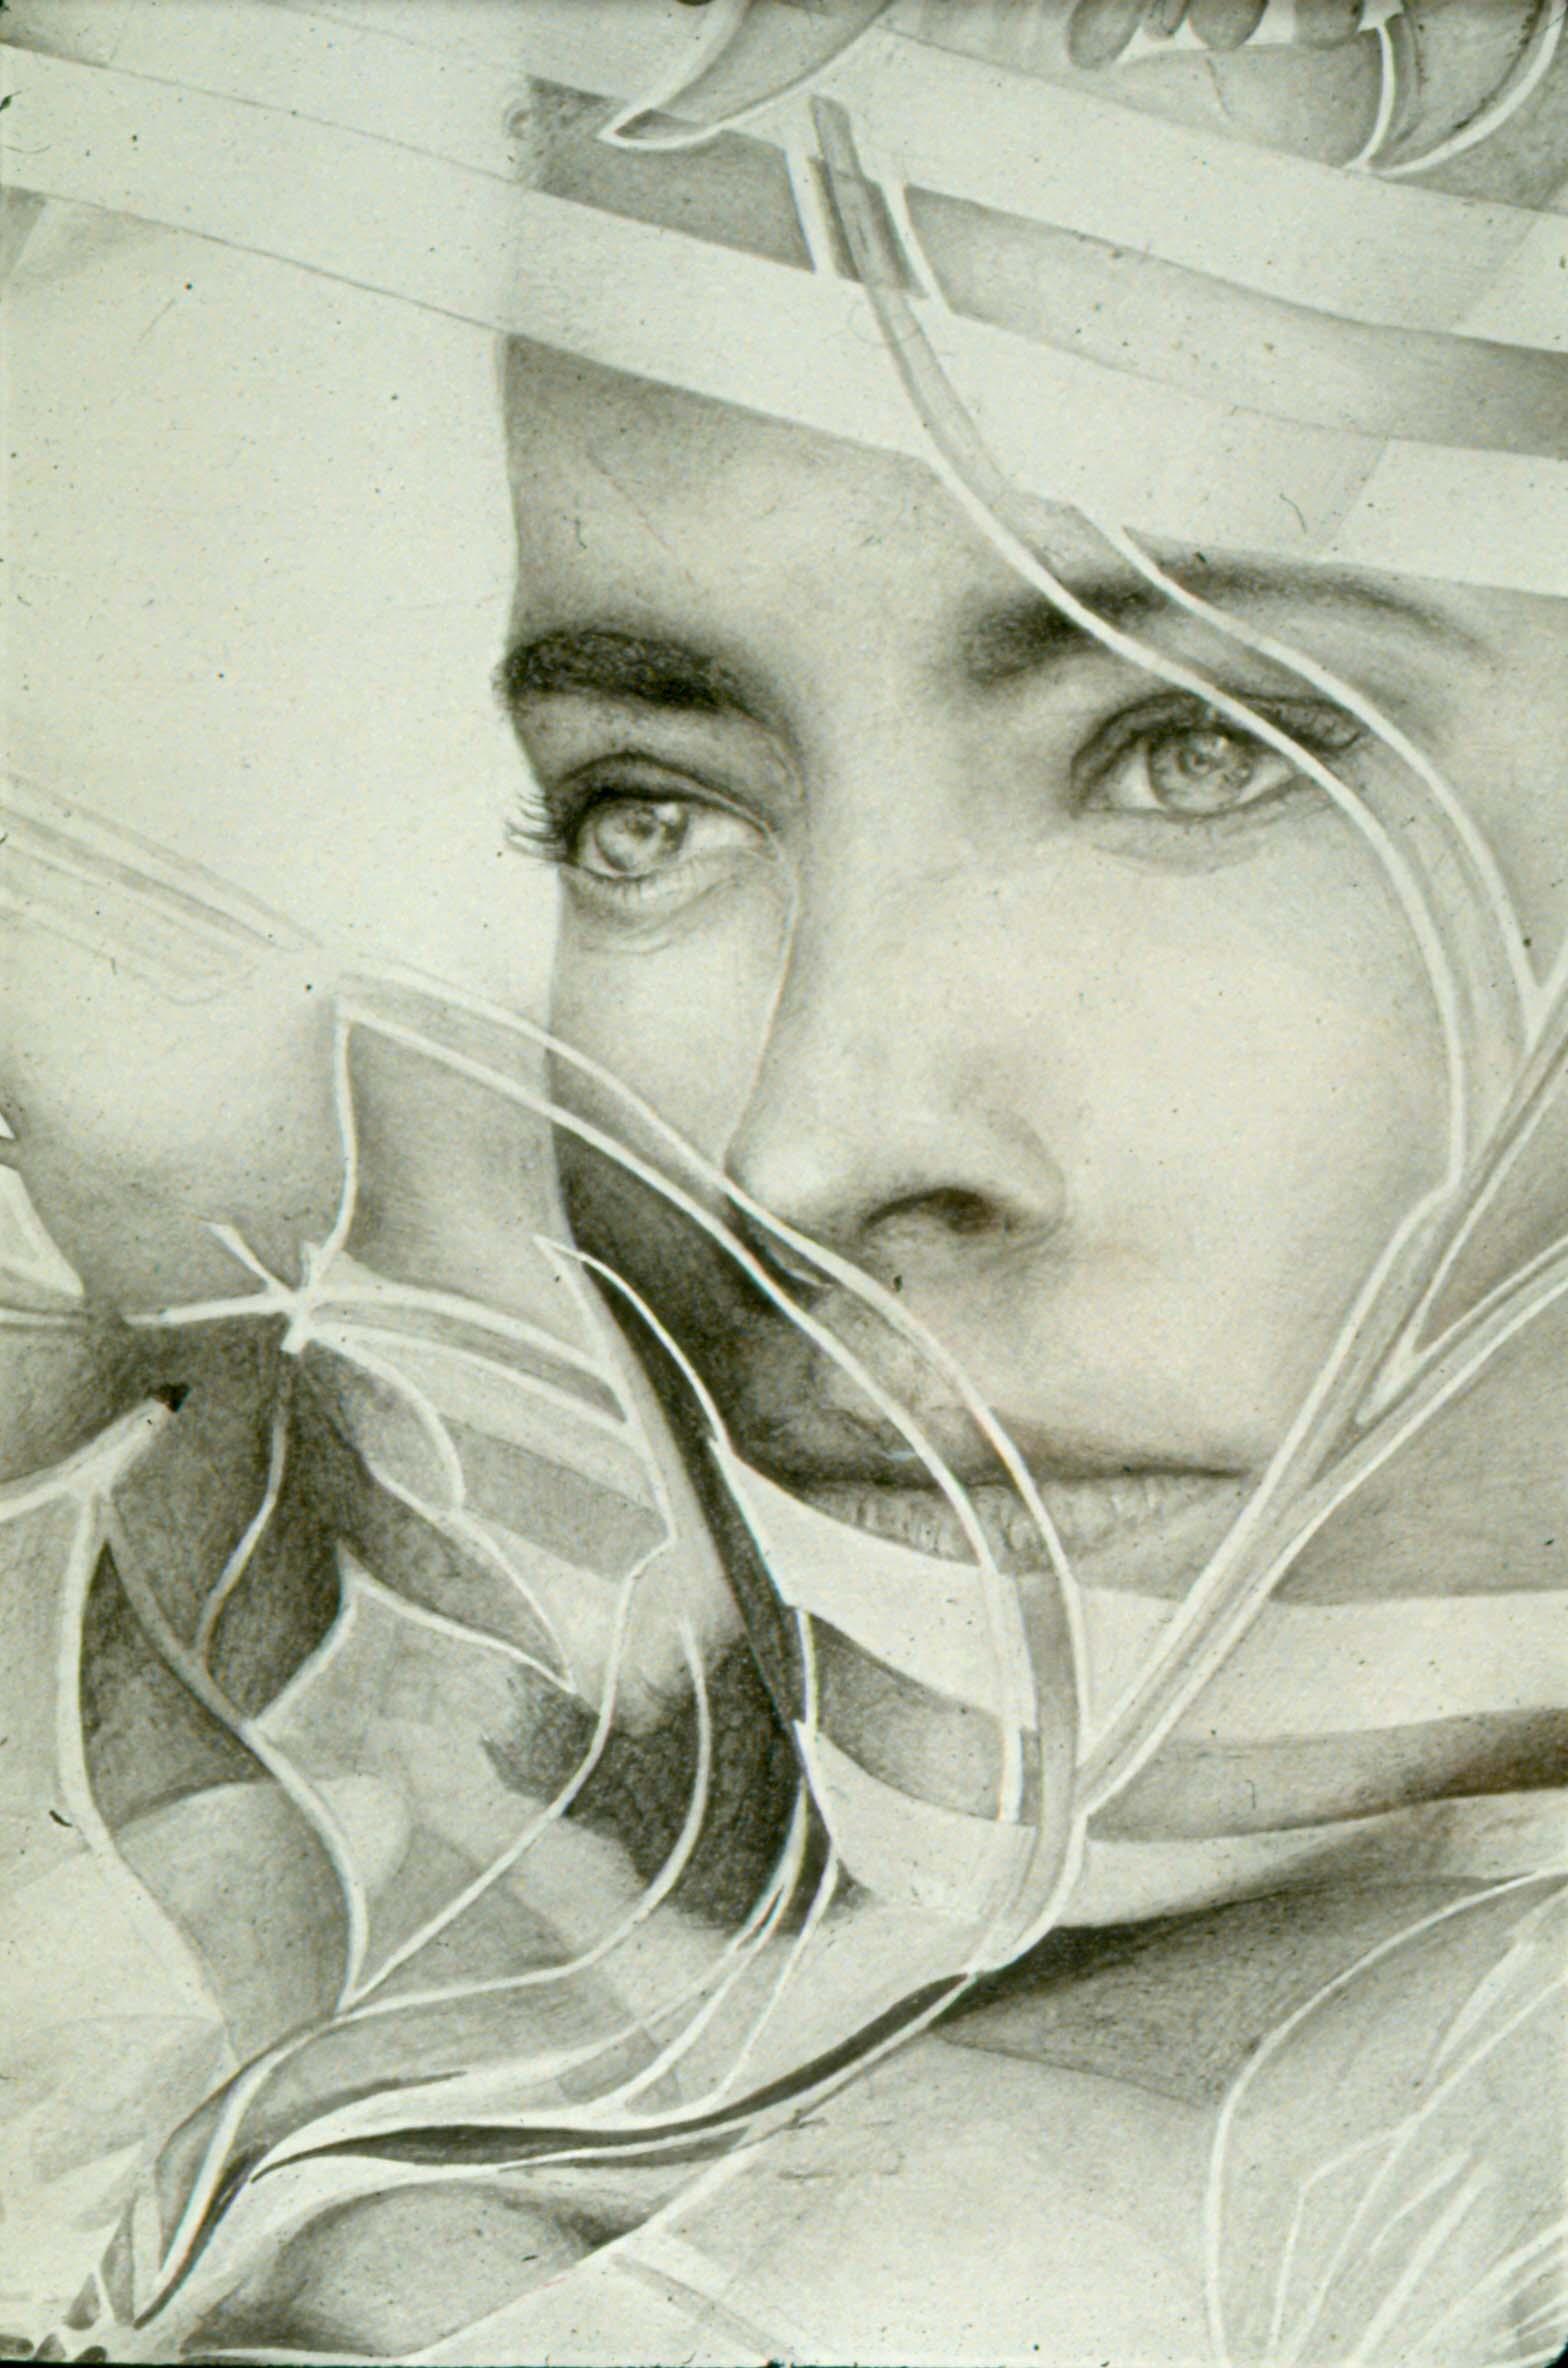 profile face looking through sheer scarf - pencil